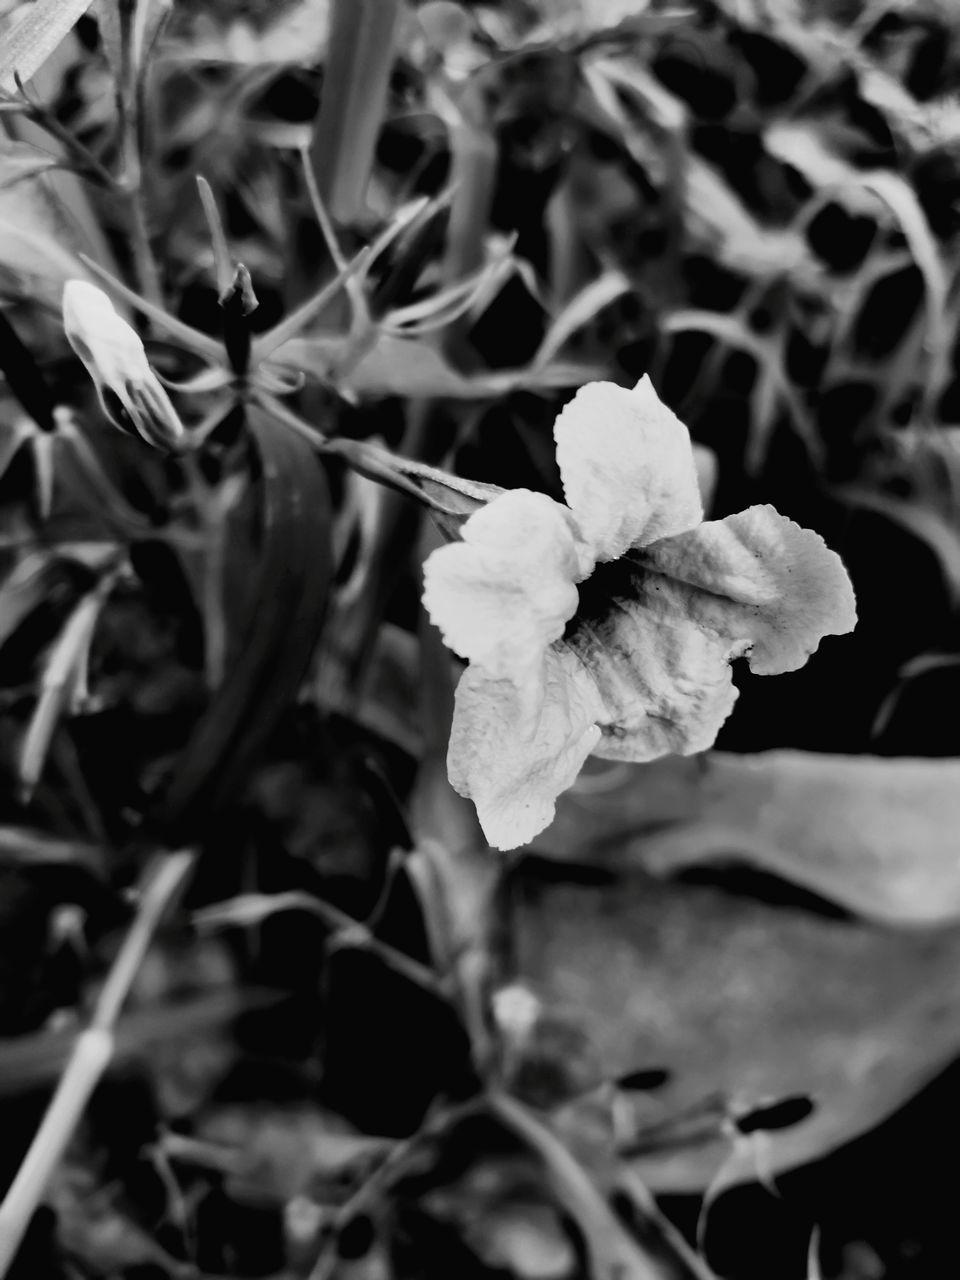 CLOSE-UP OF FRESH WHITE ROSE FLOWER